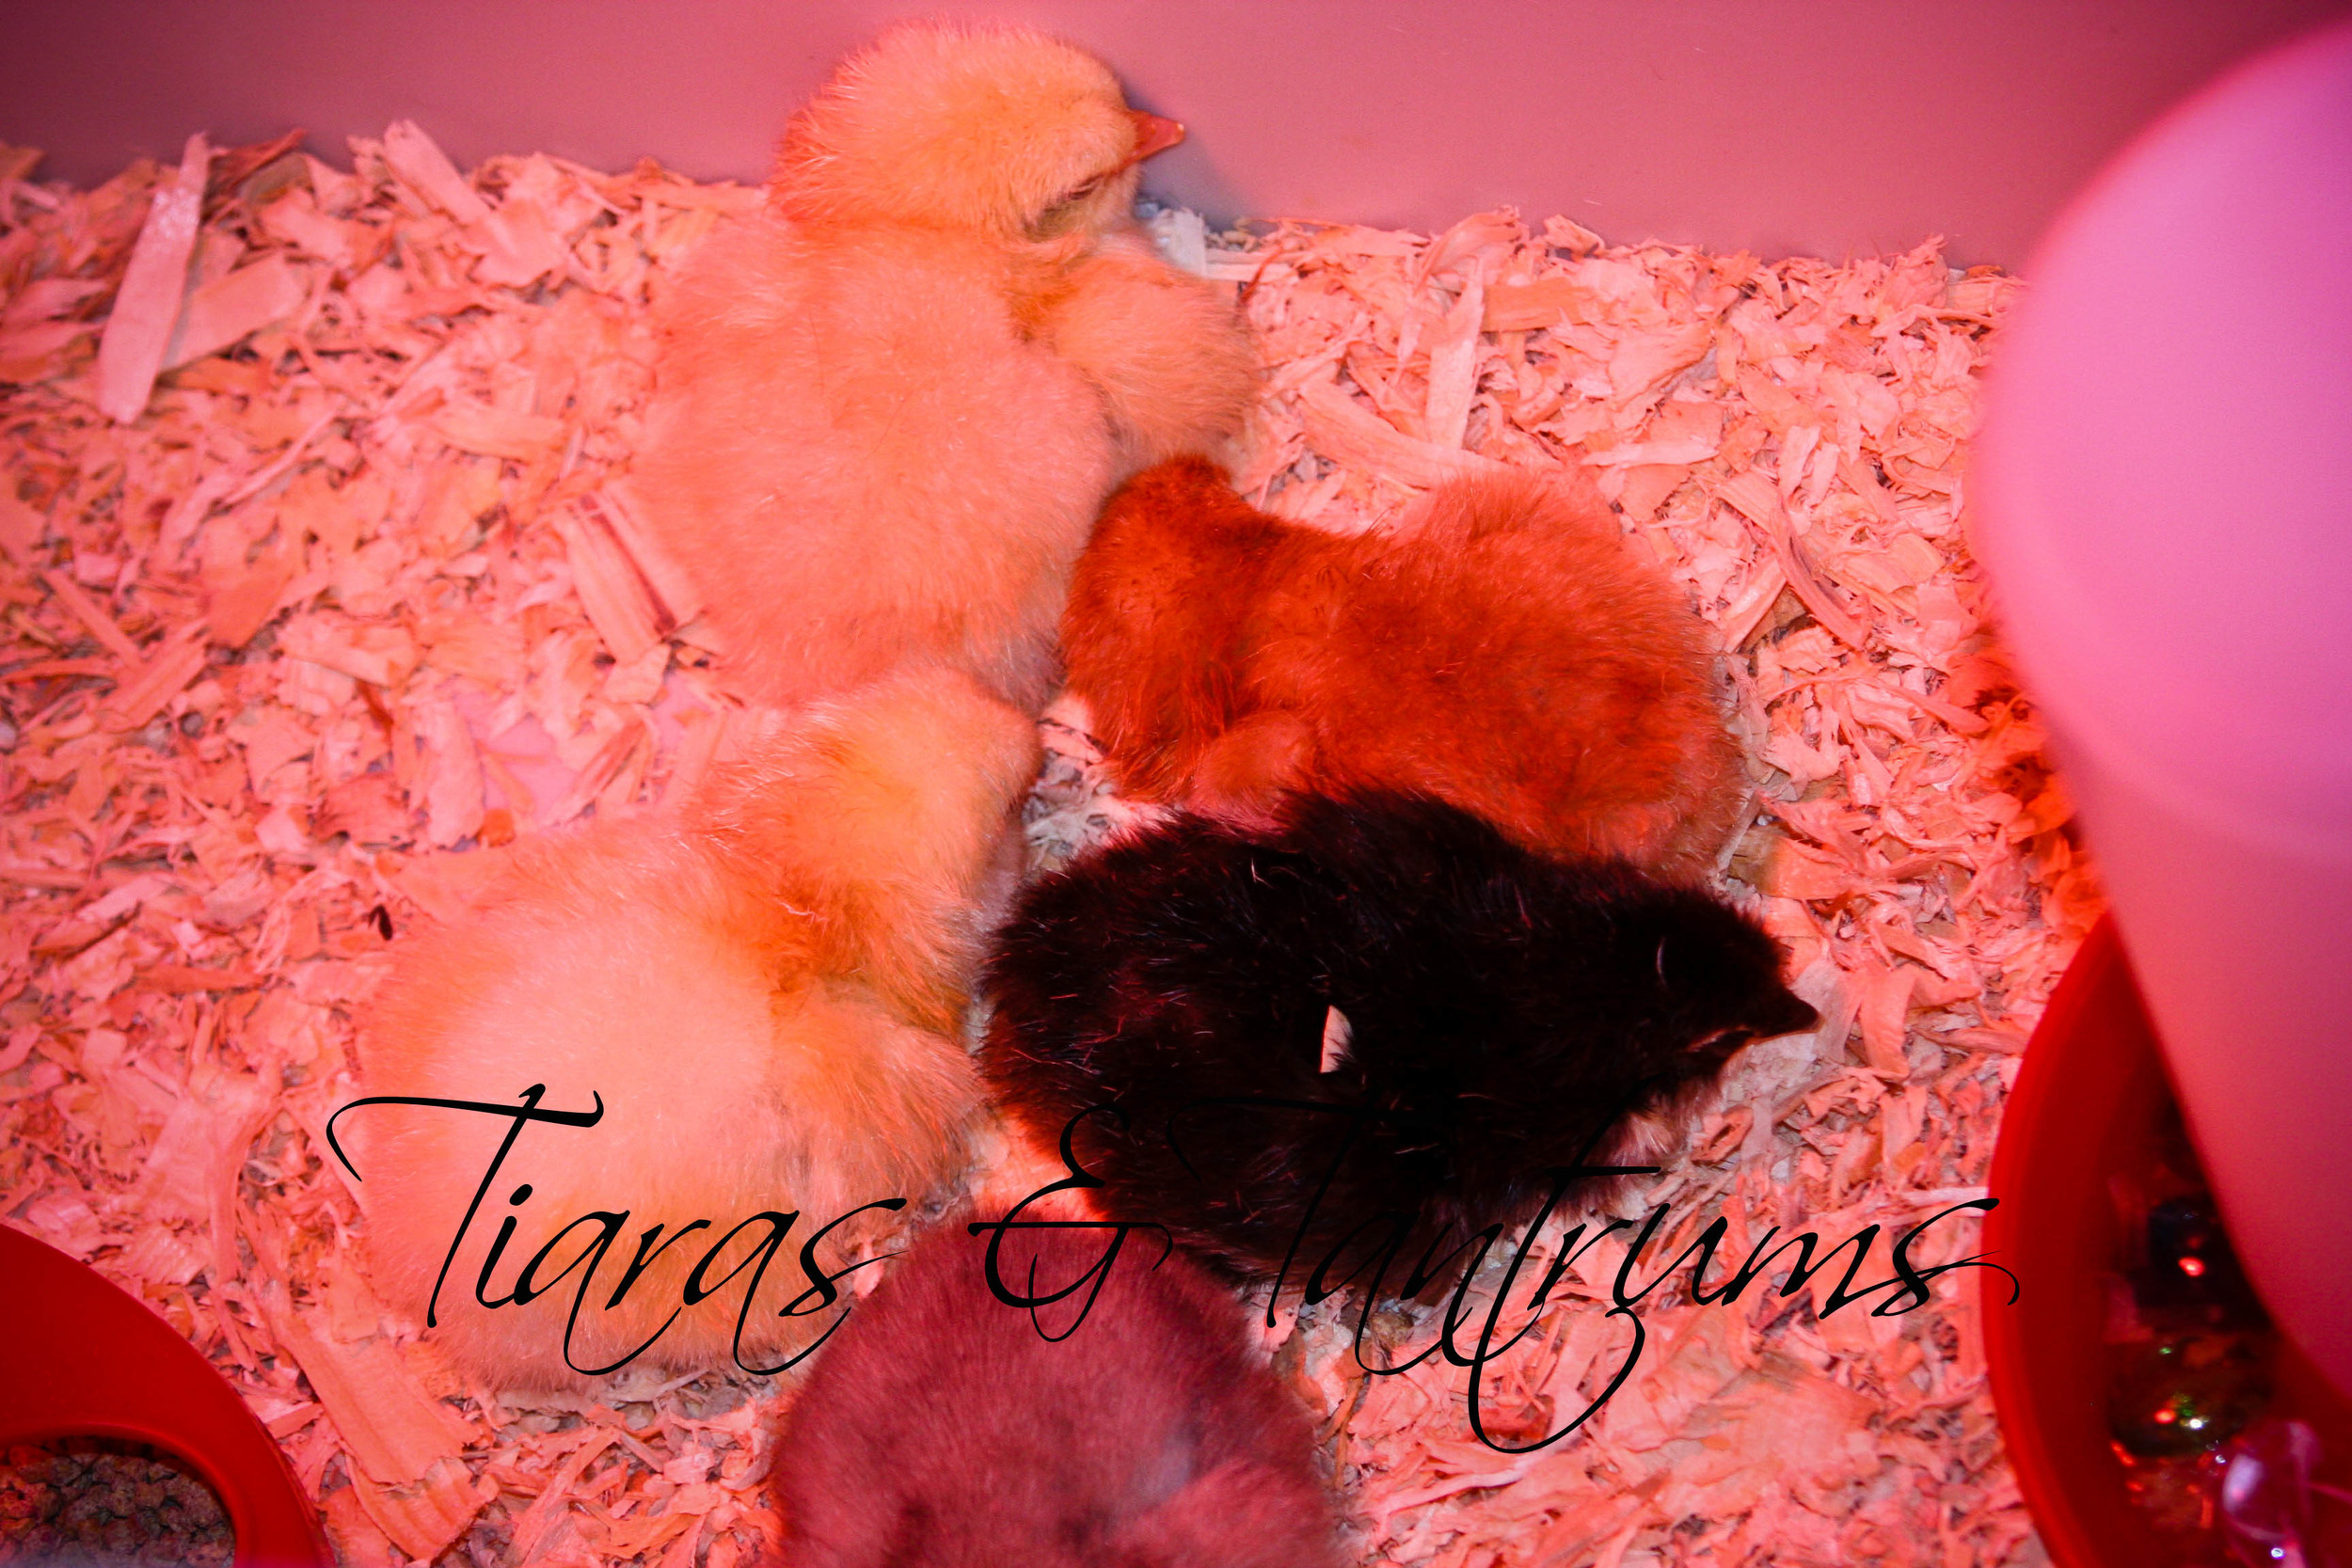 chicks (1 of 1).jpg